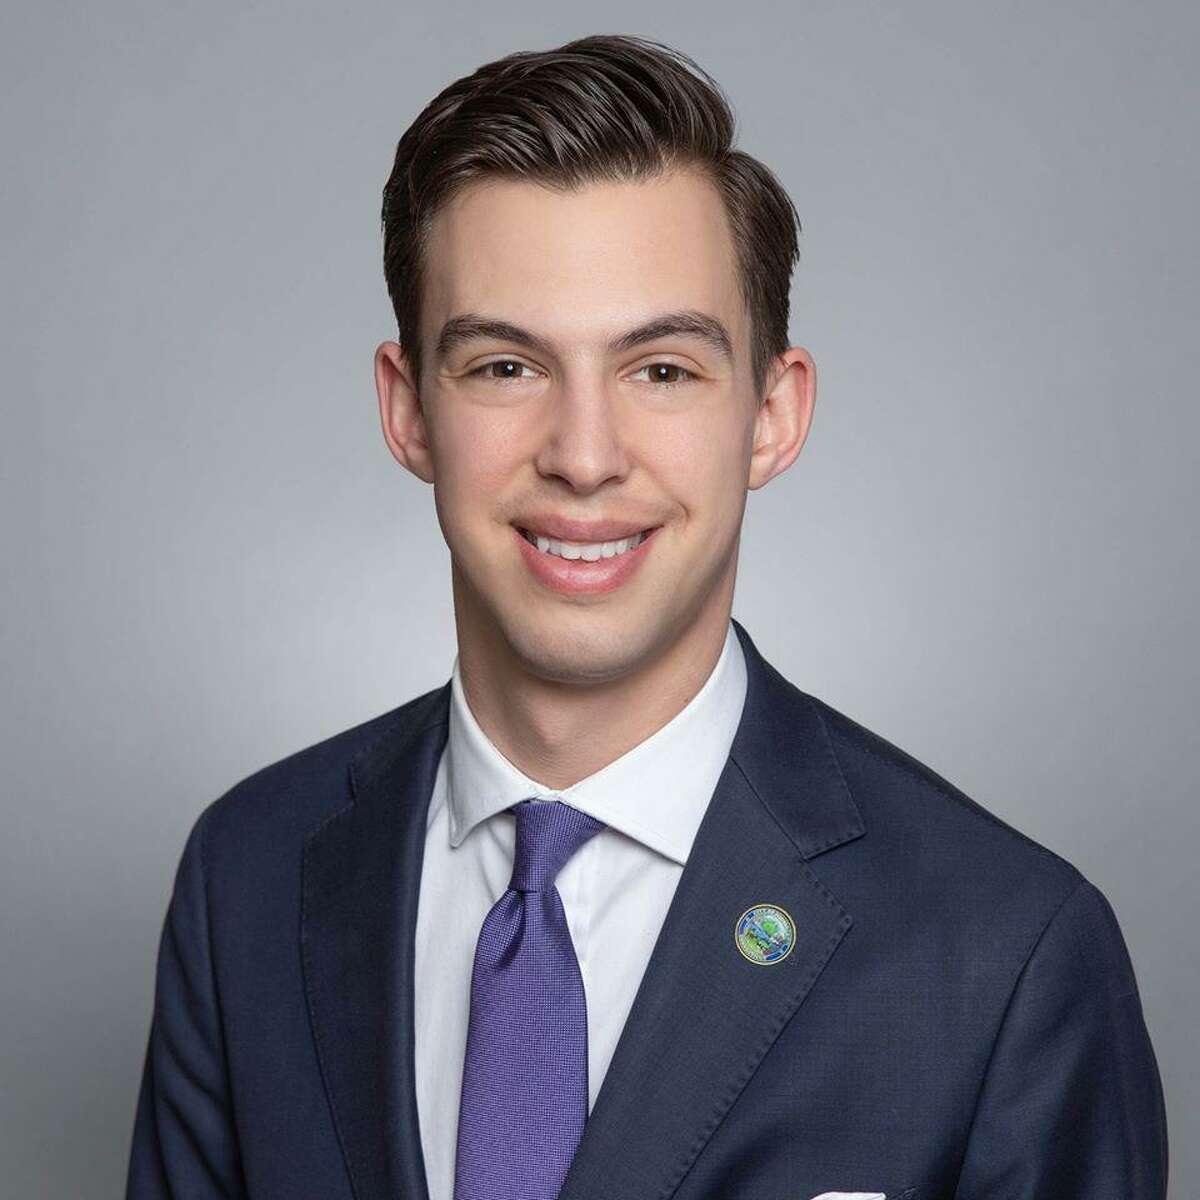 Middletown Mayor Ben Florsheim